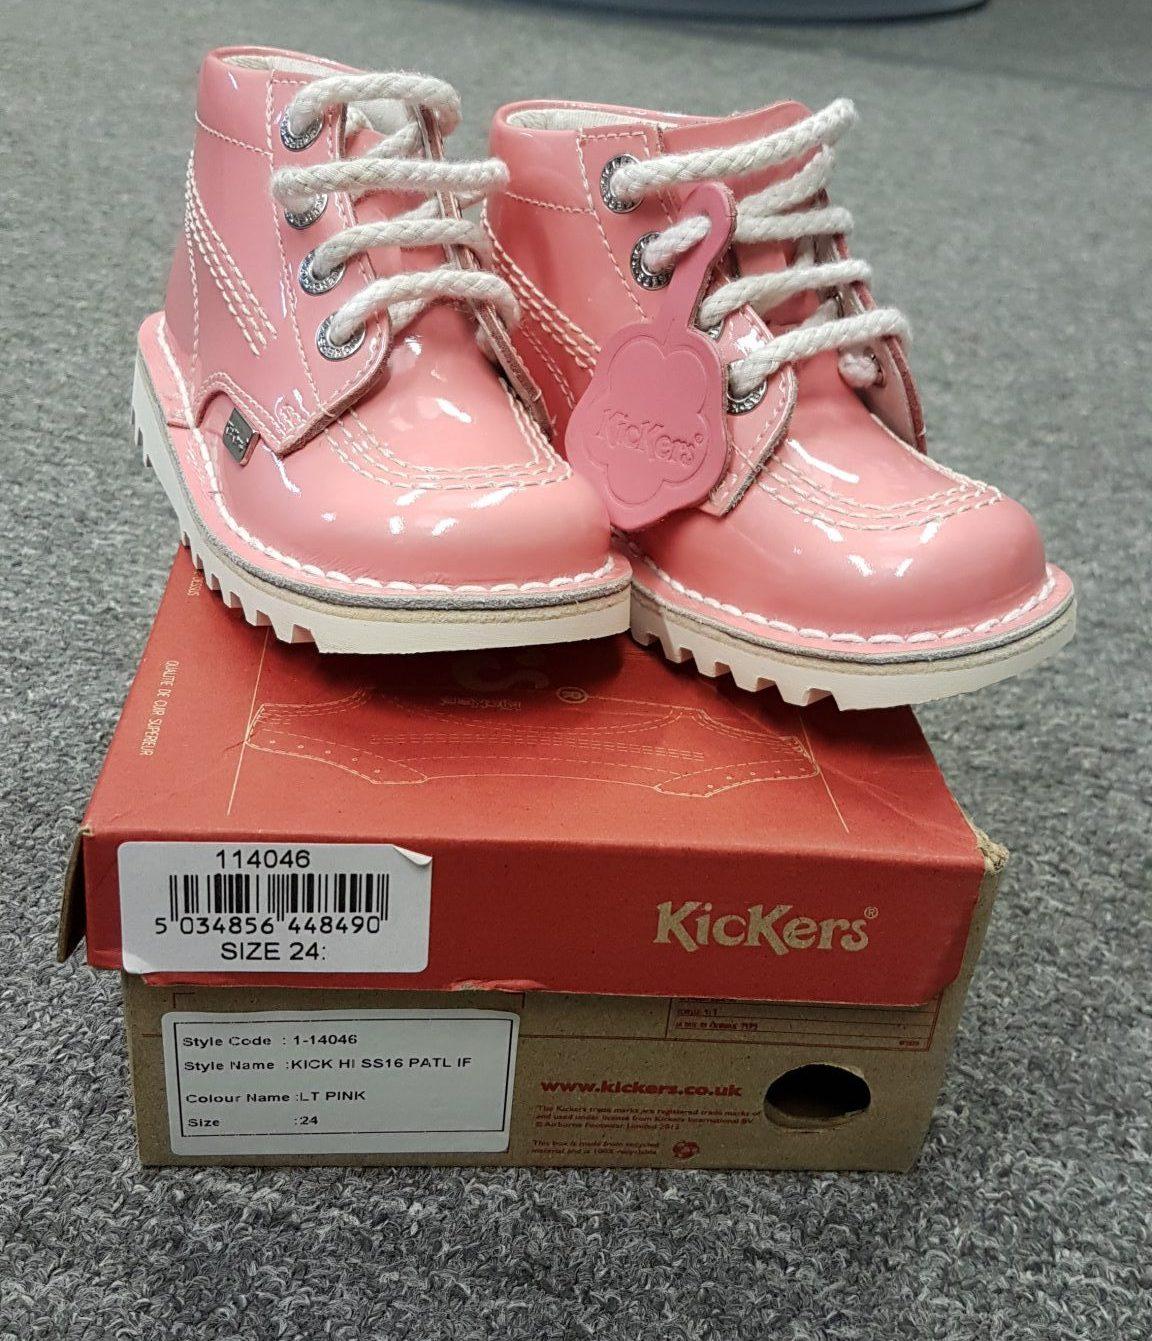 Kicker Girls Boots Candy Pink Patent